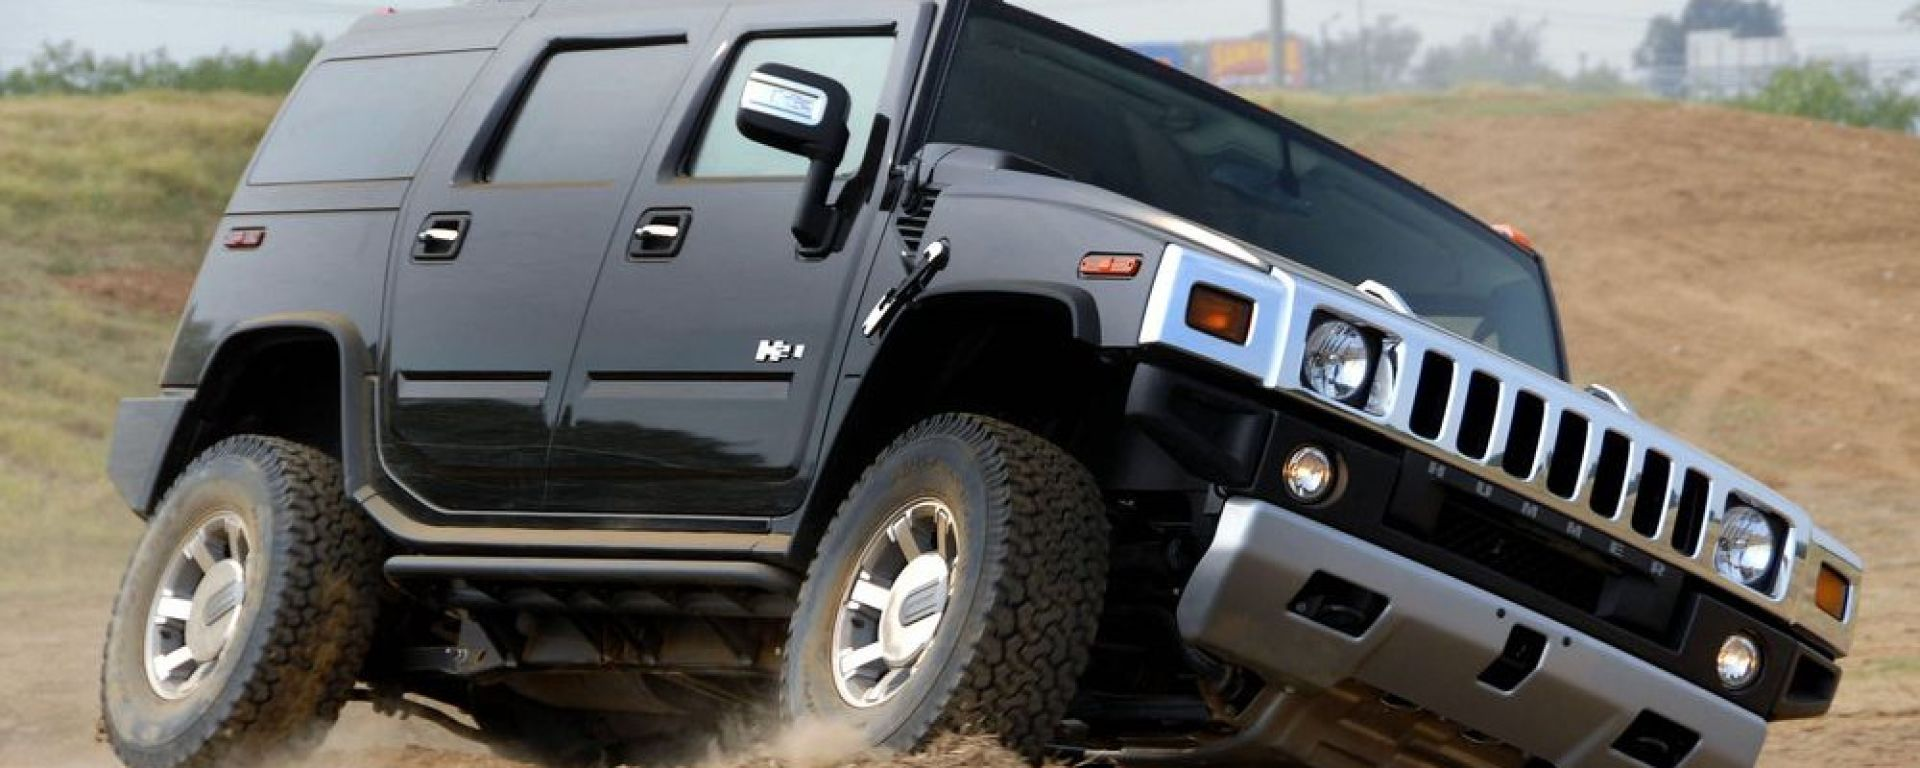 Hummer elettrica nel 2022? I piani di General Motors